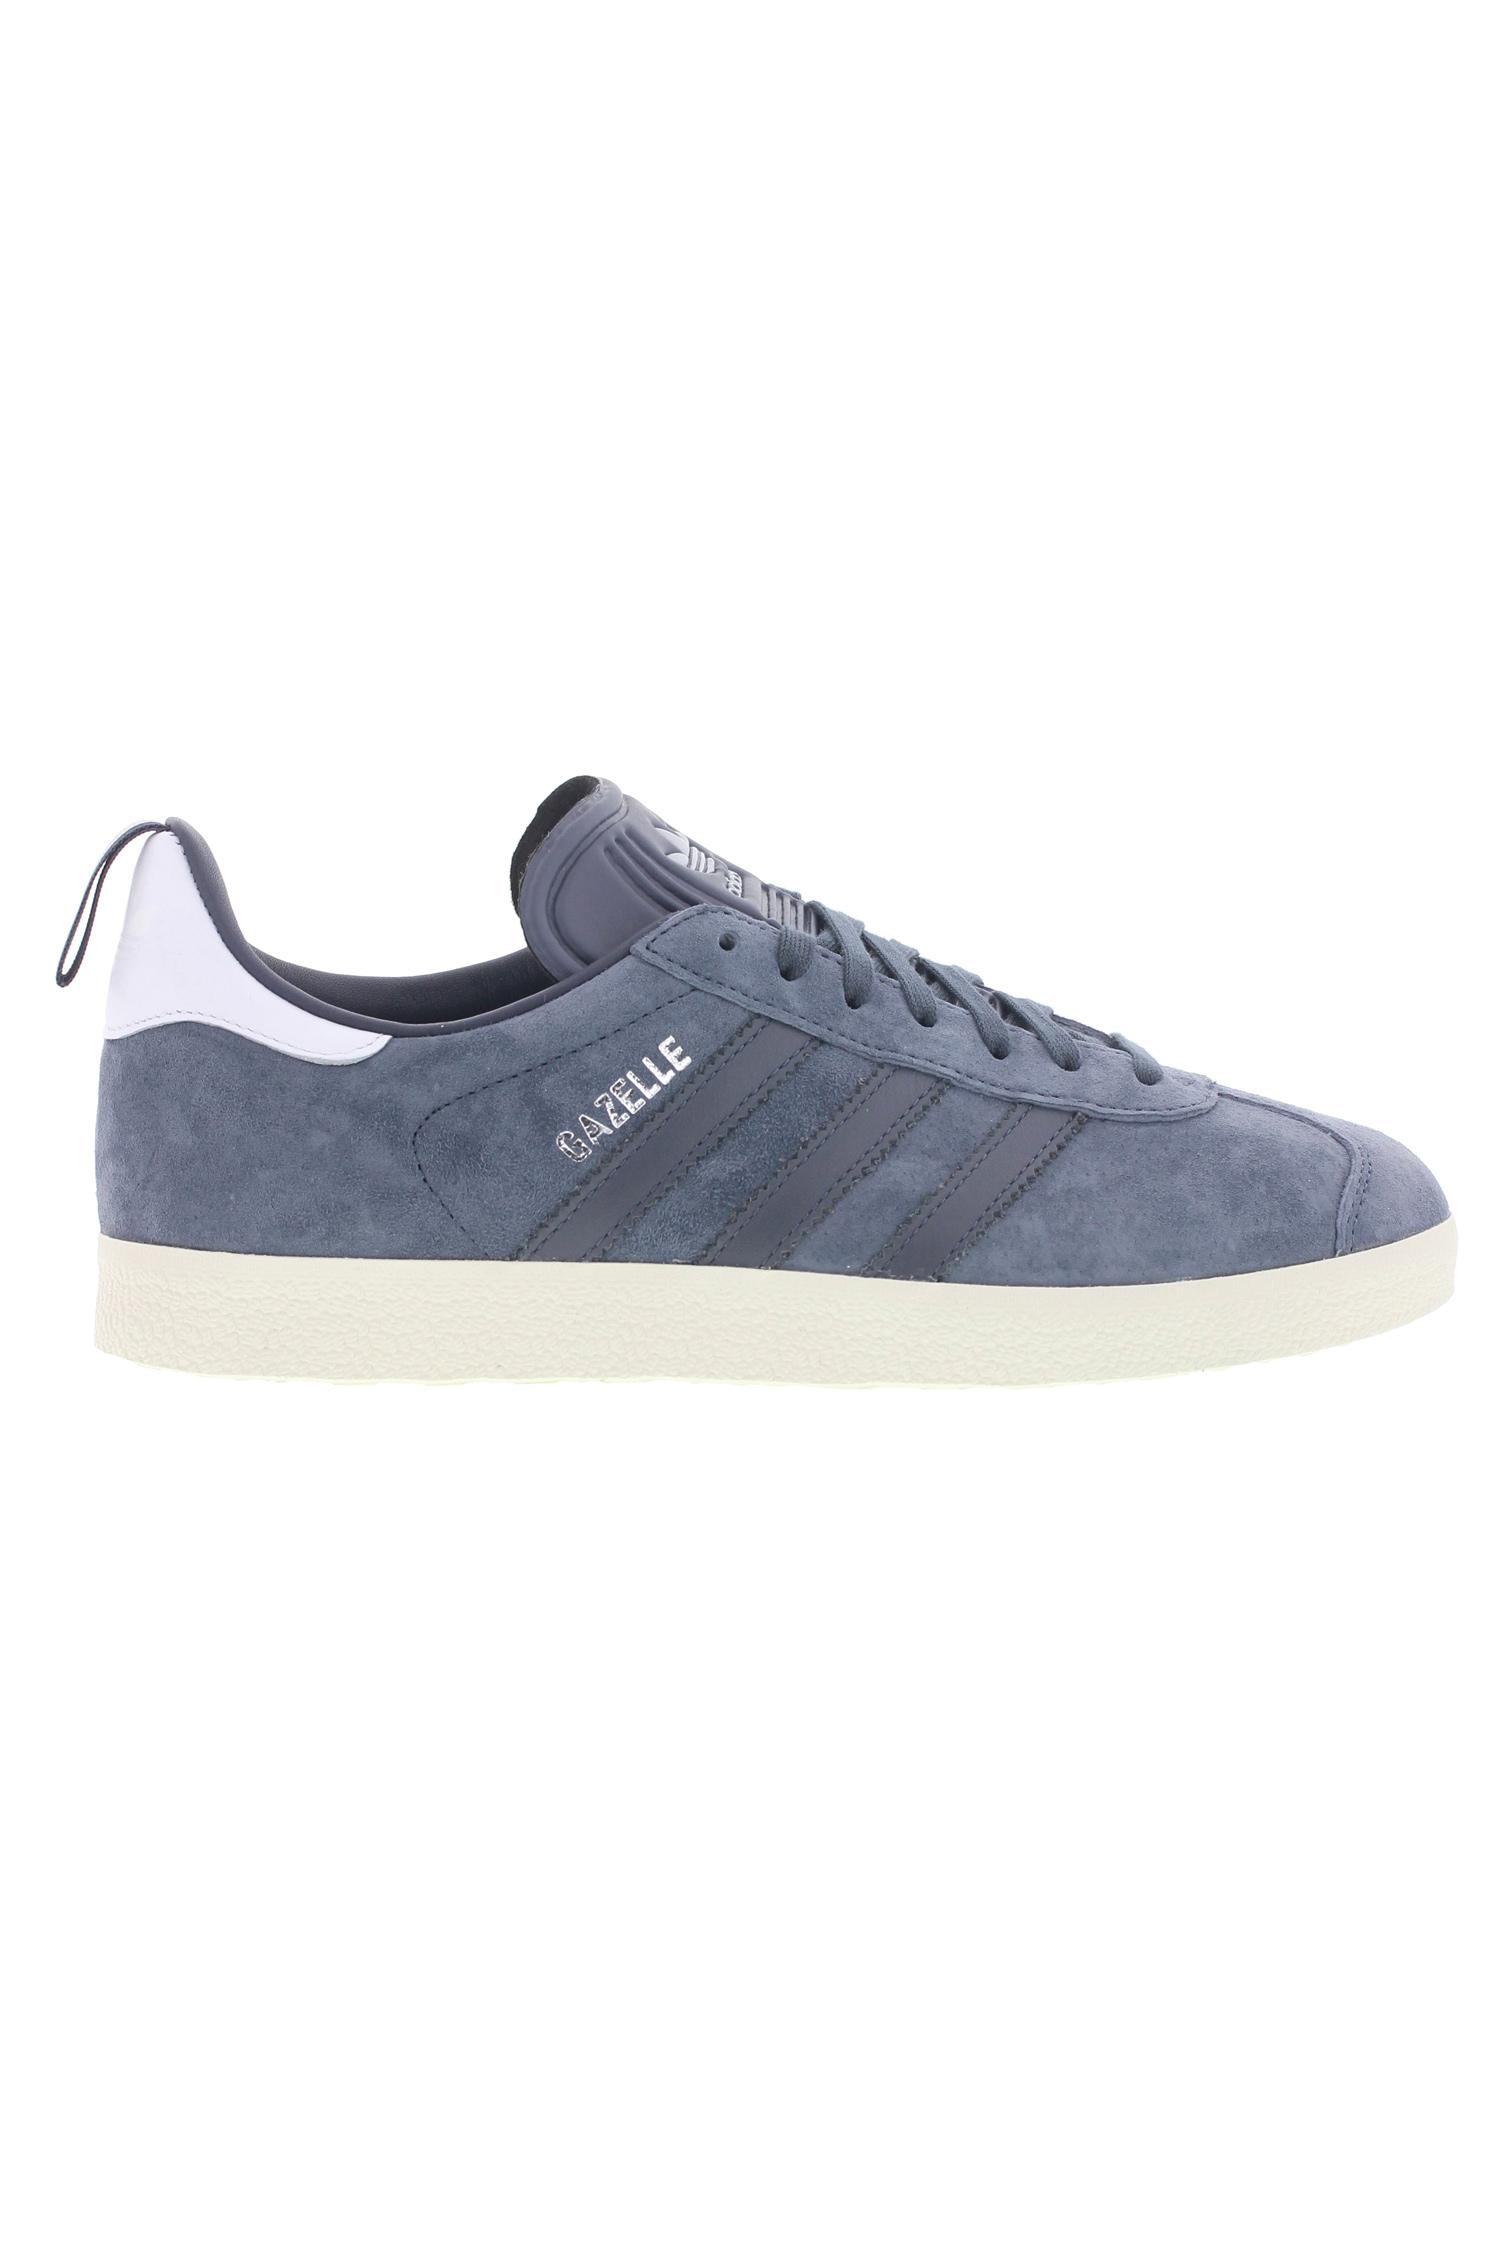 Adidas Originals / Gazelle ...